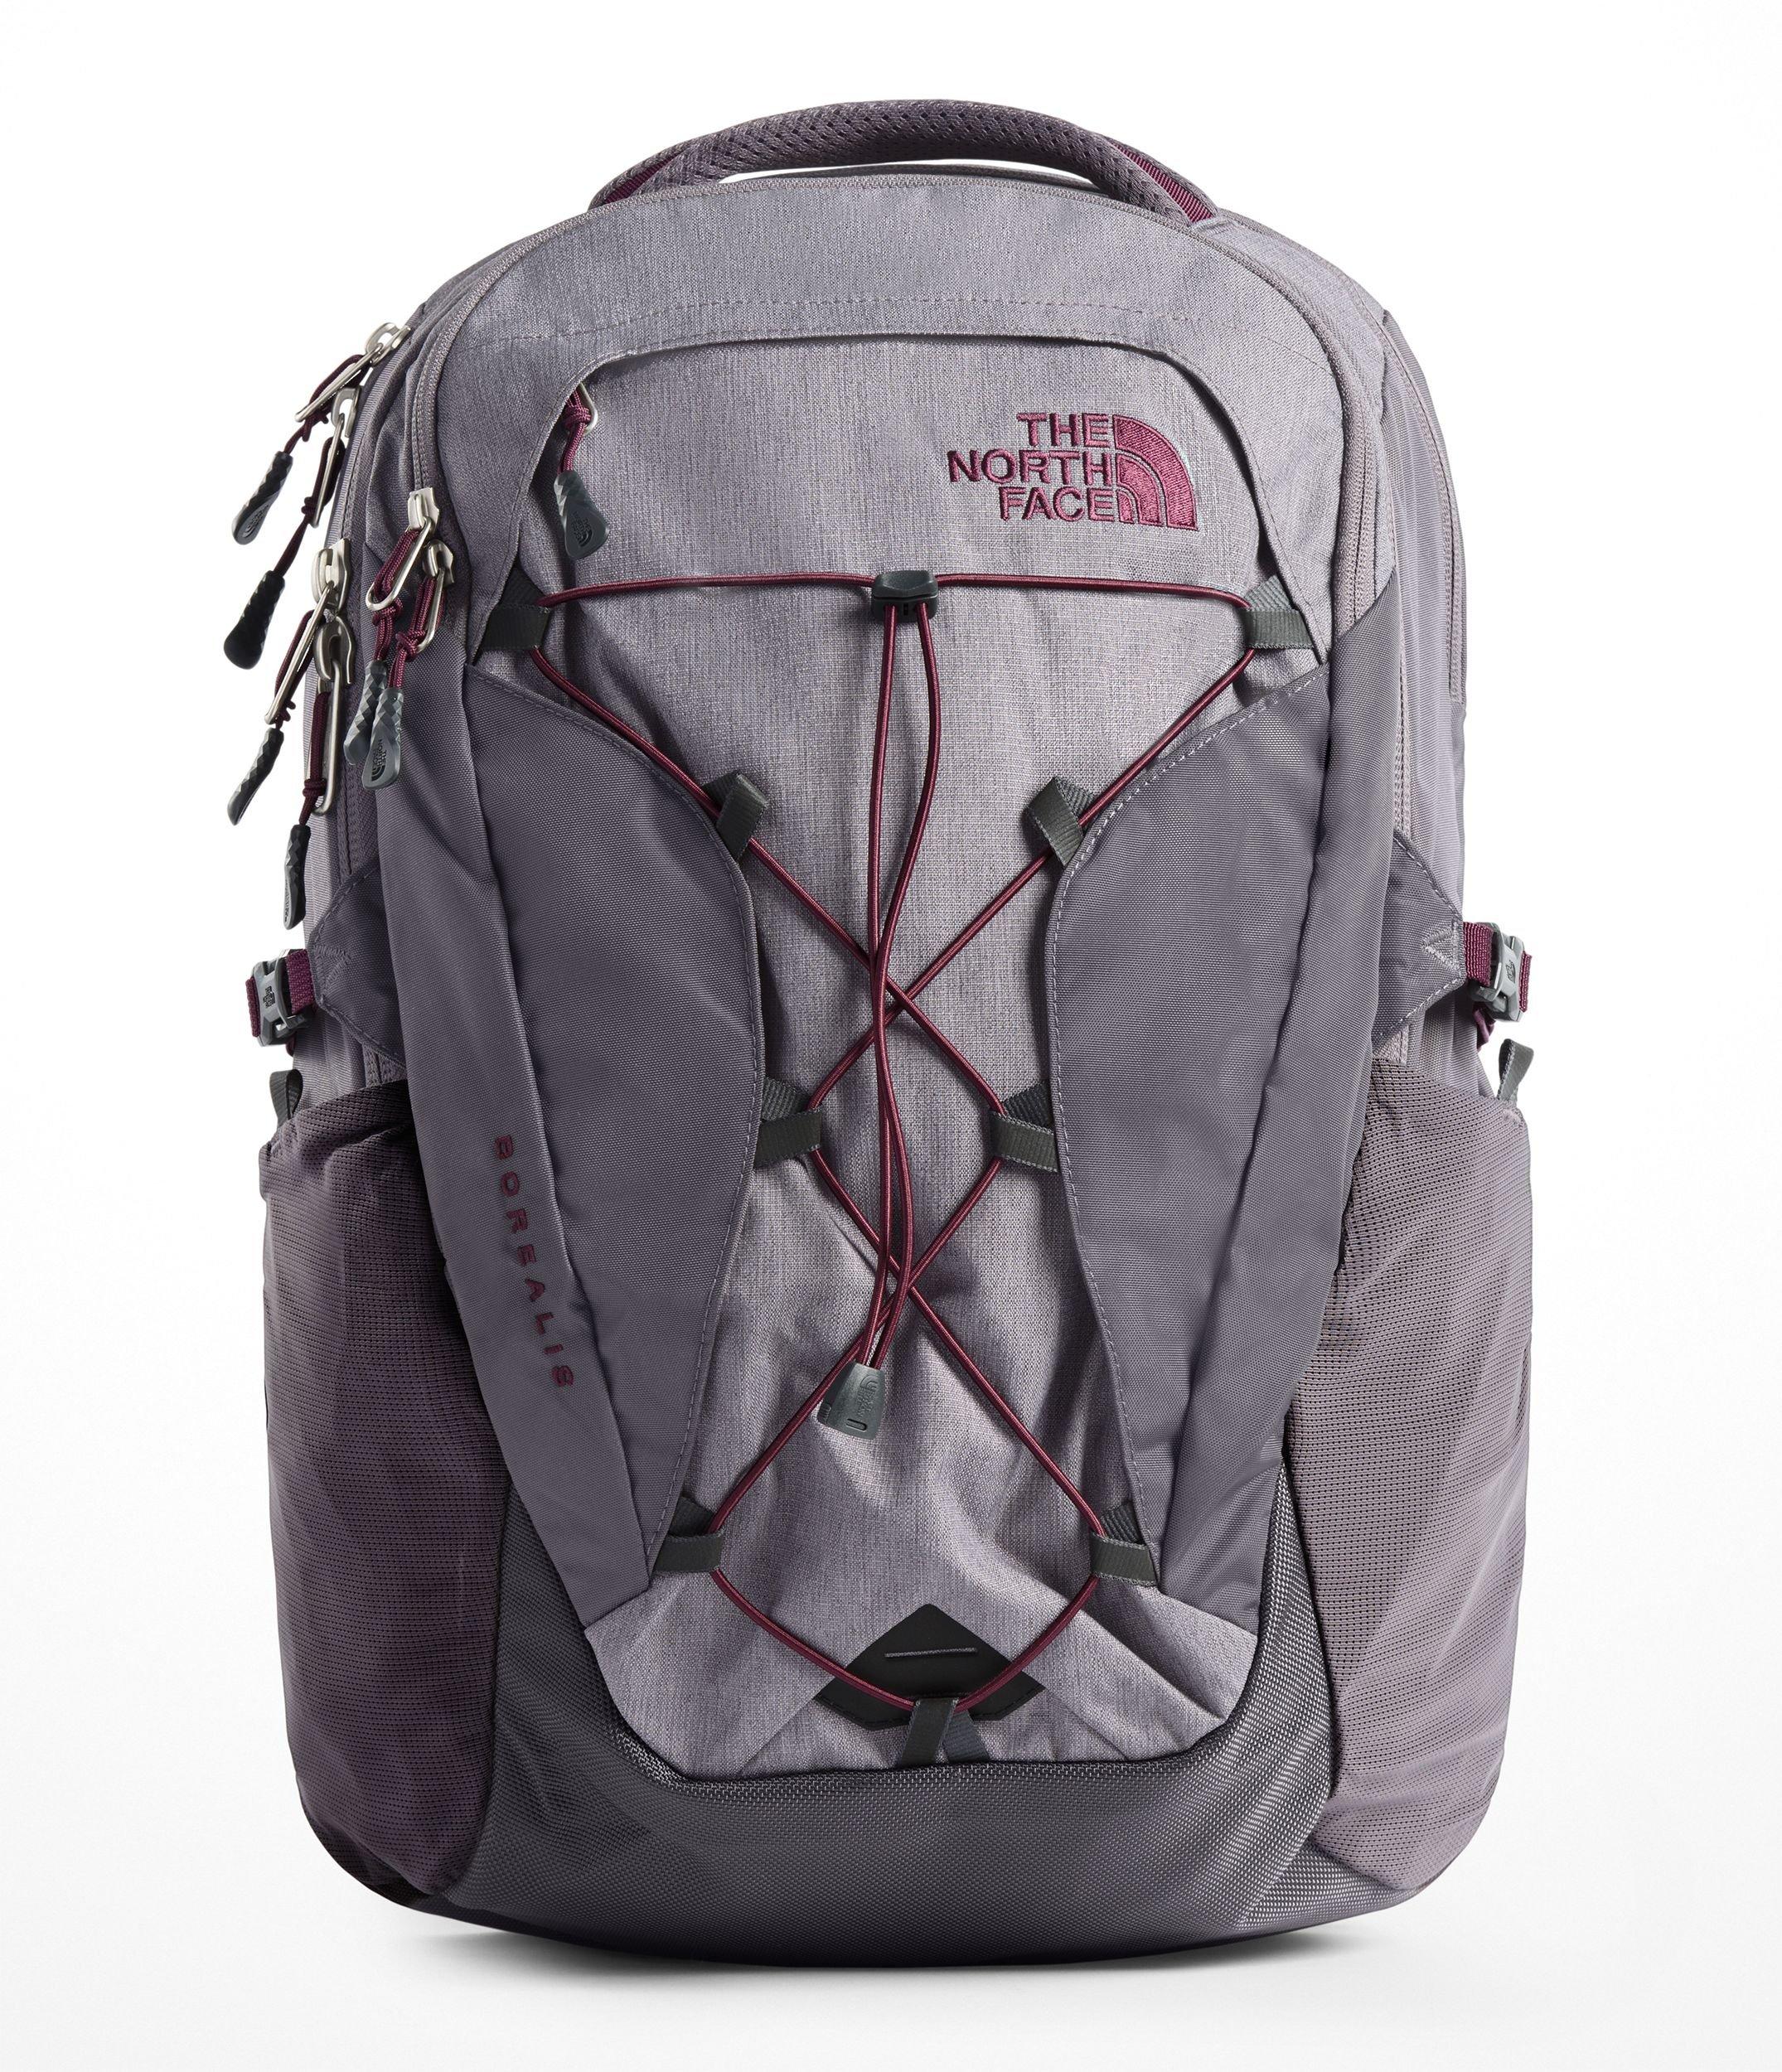 The North Face Women's Borealis Backpack - Rabbit Grey Light Heather & Rabbit Grey - OS